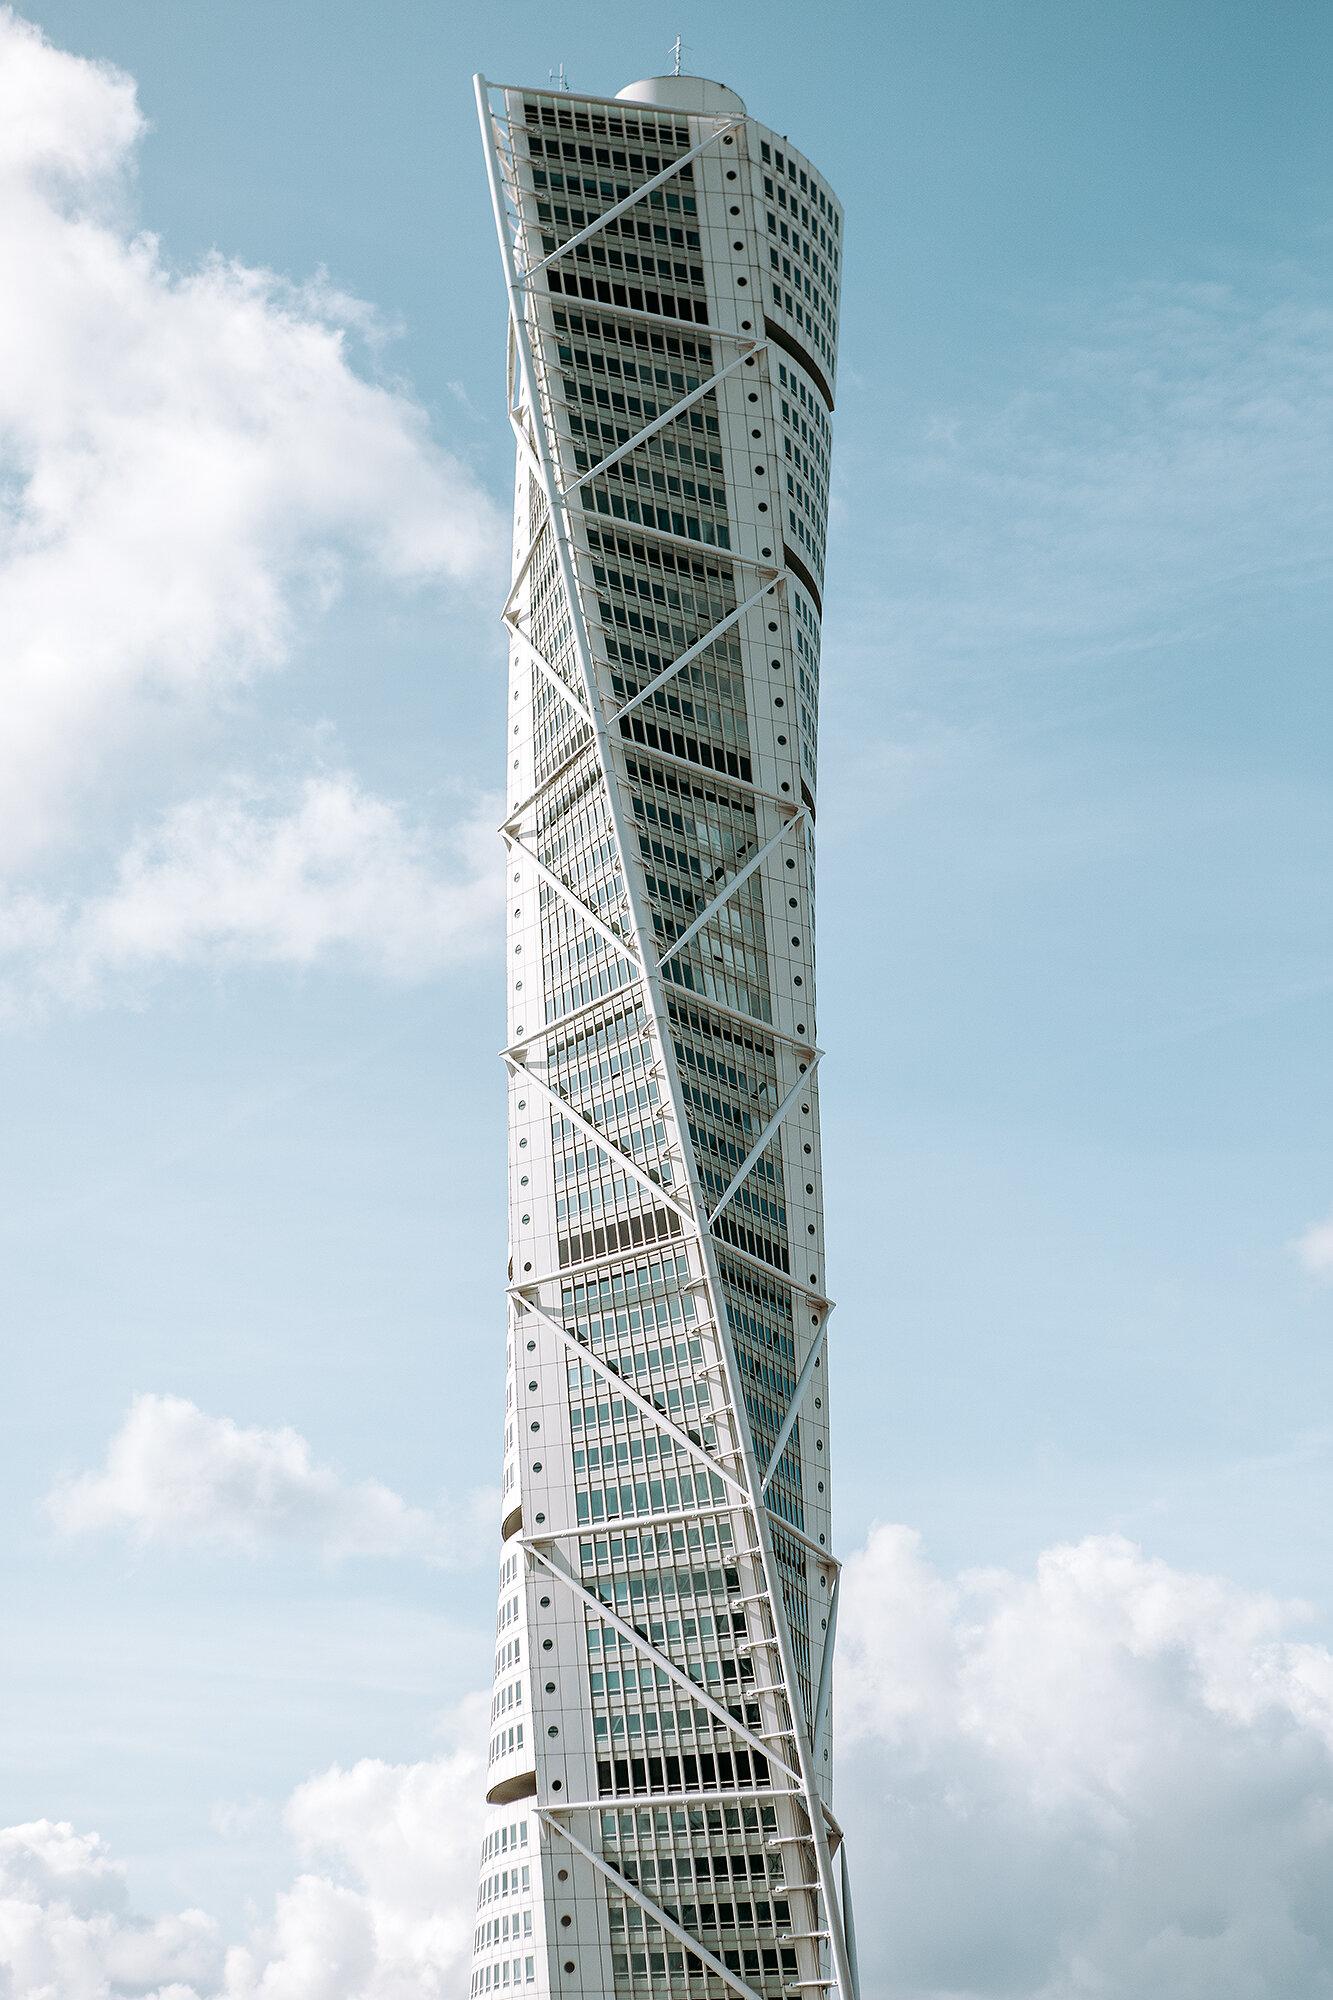 The Turning Torso in Malmö   Scandinavia's tallest building